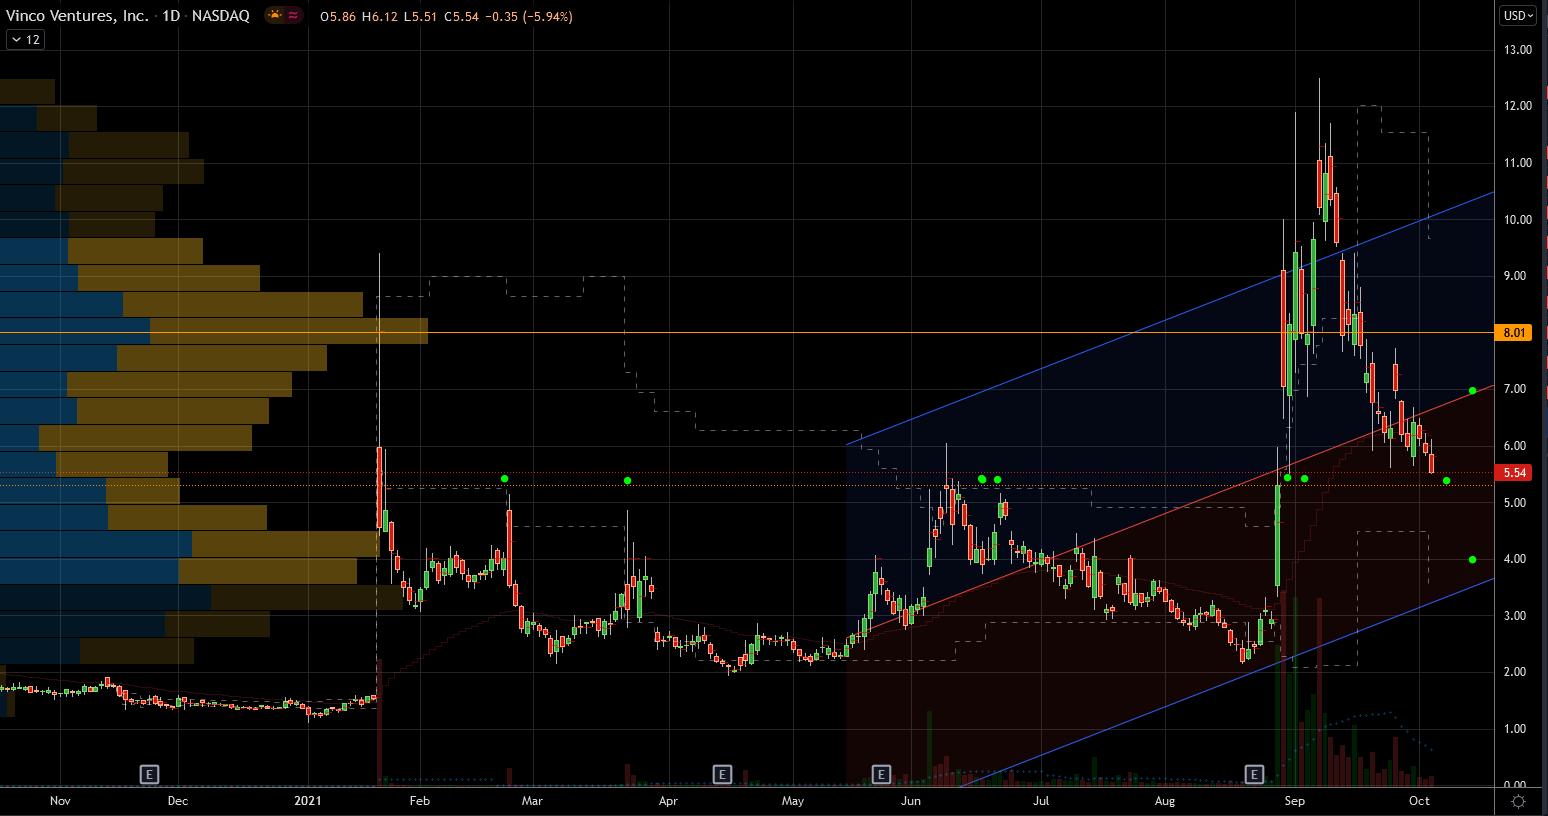 Vinco Ventures (BBIG) Stock Showing Extreme Volatility